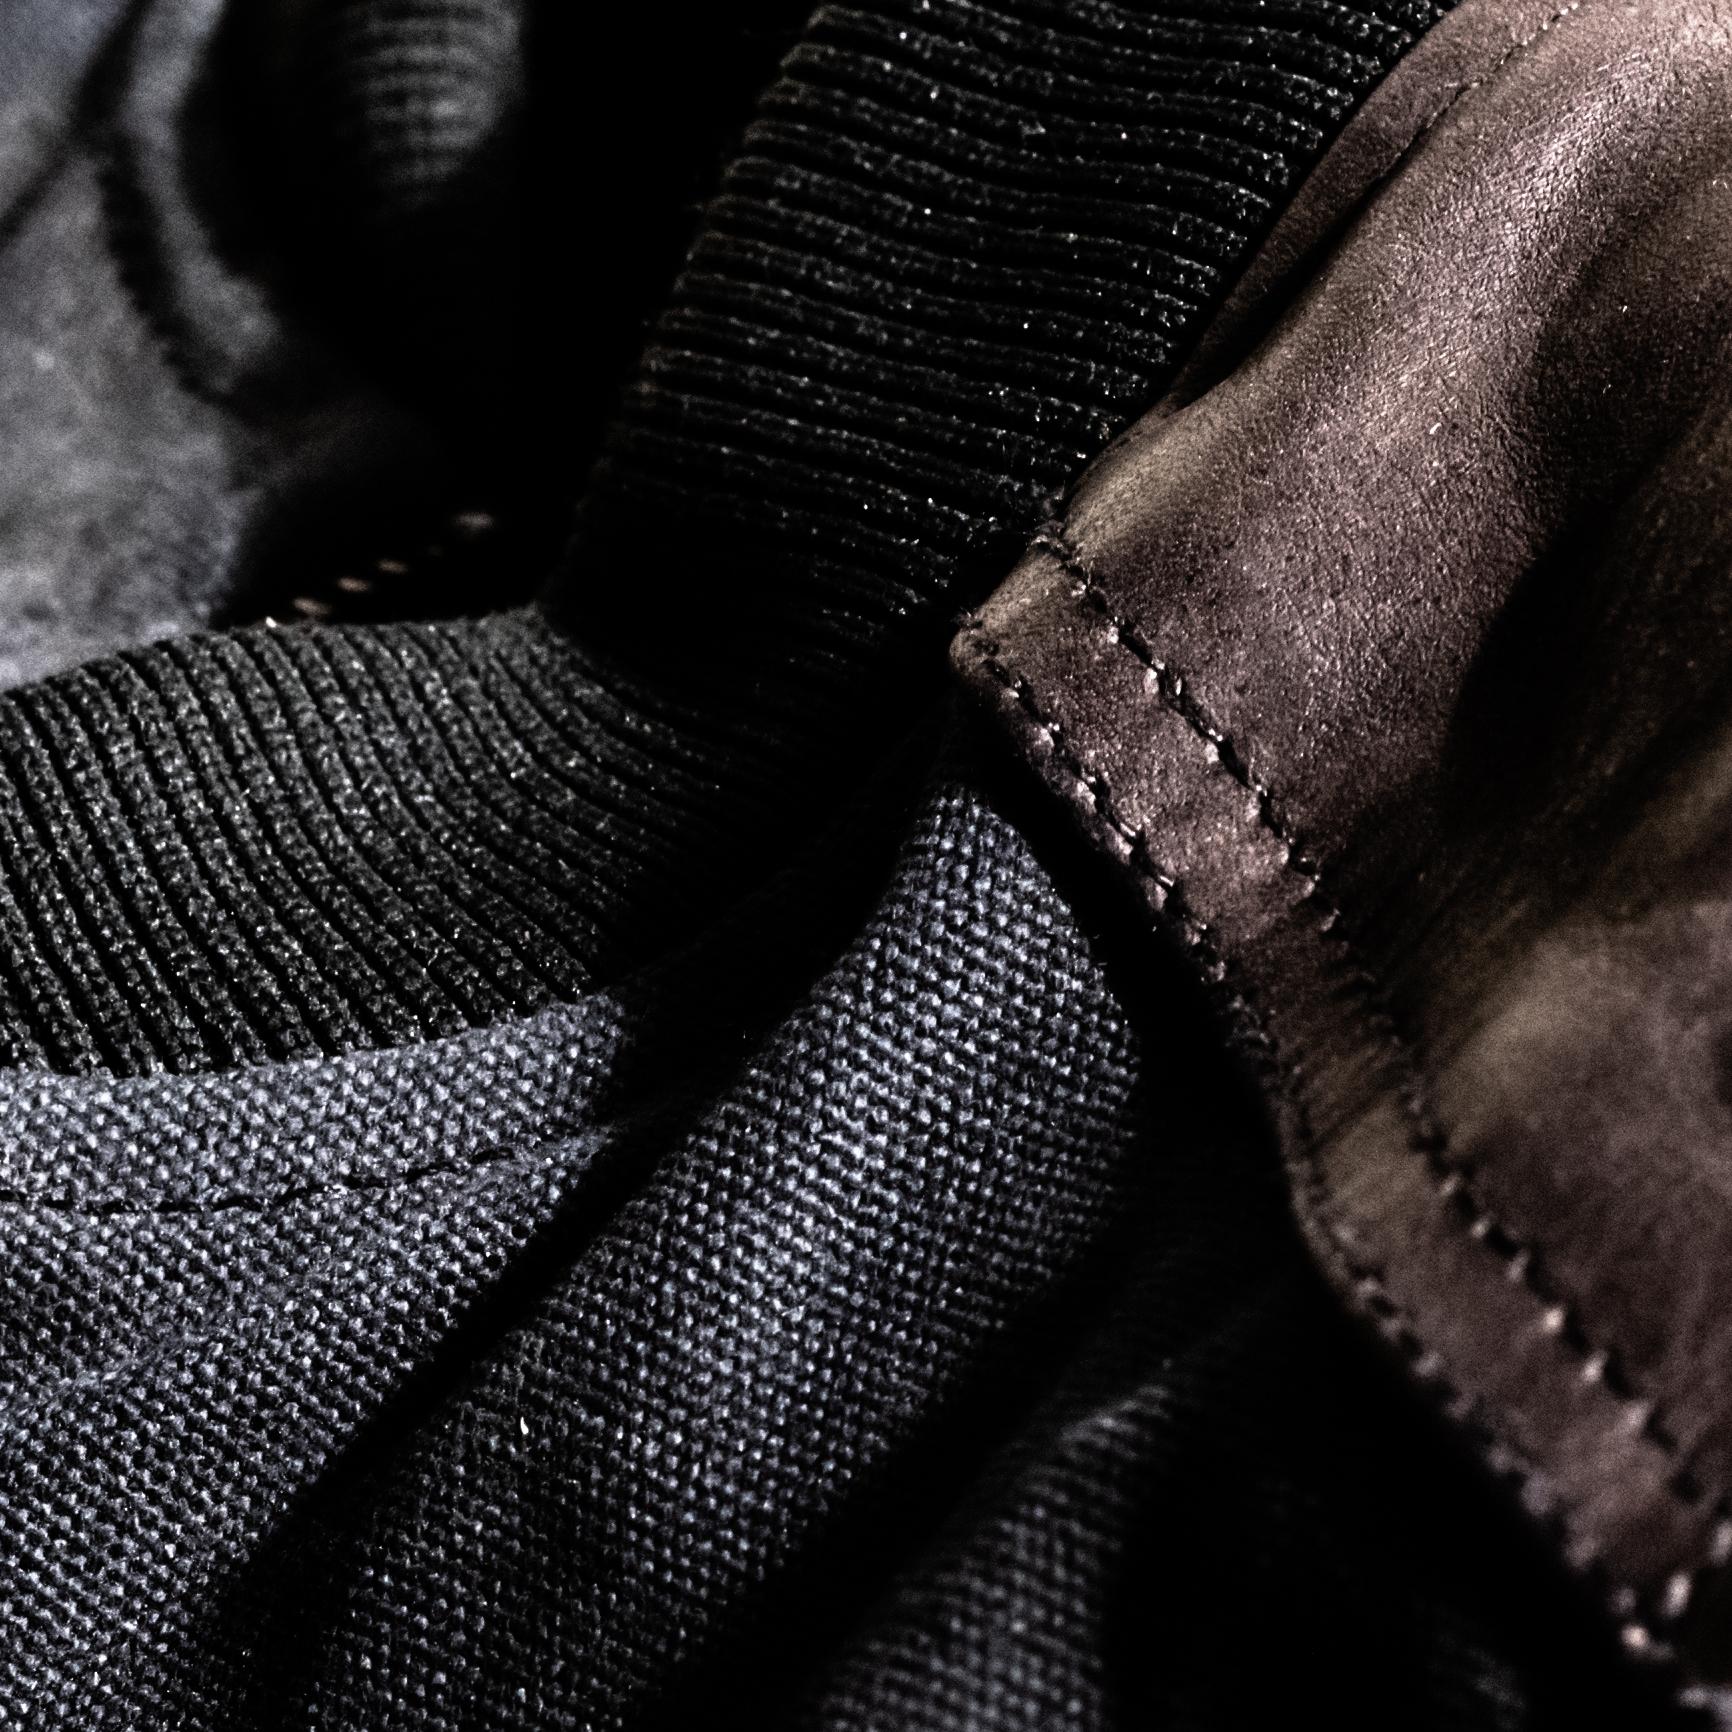 Black Bear Brand material